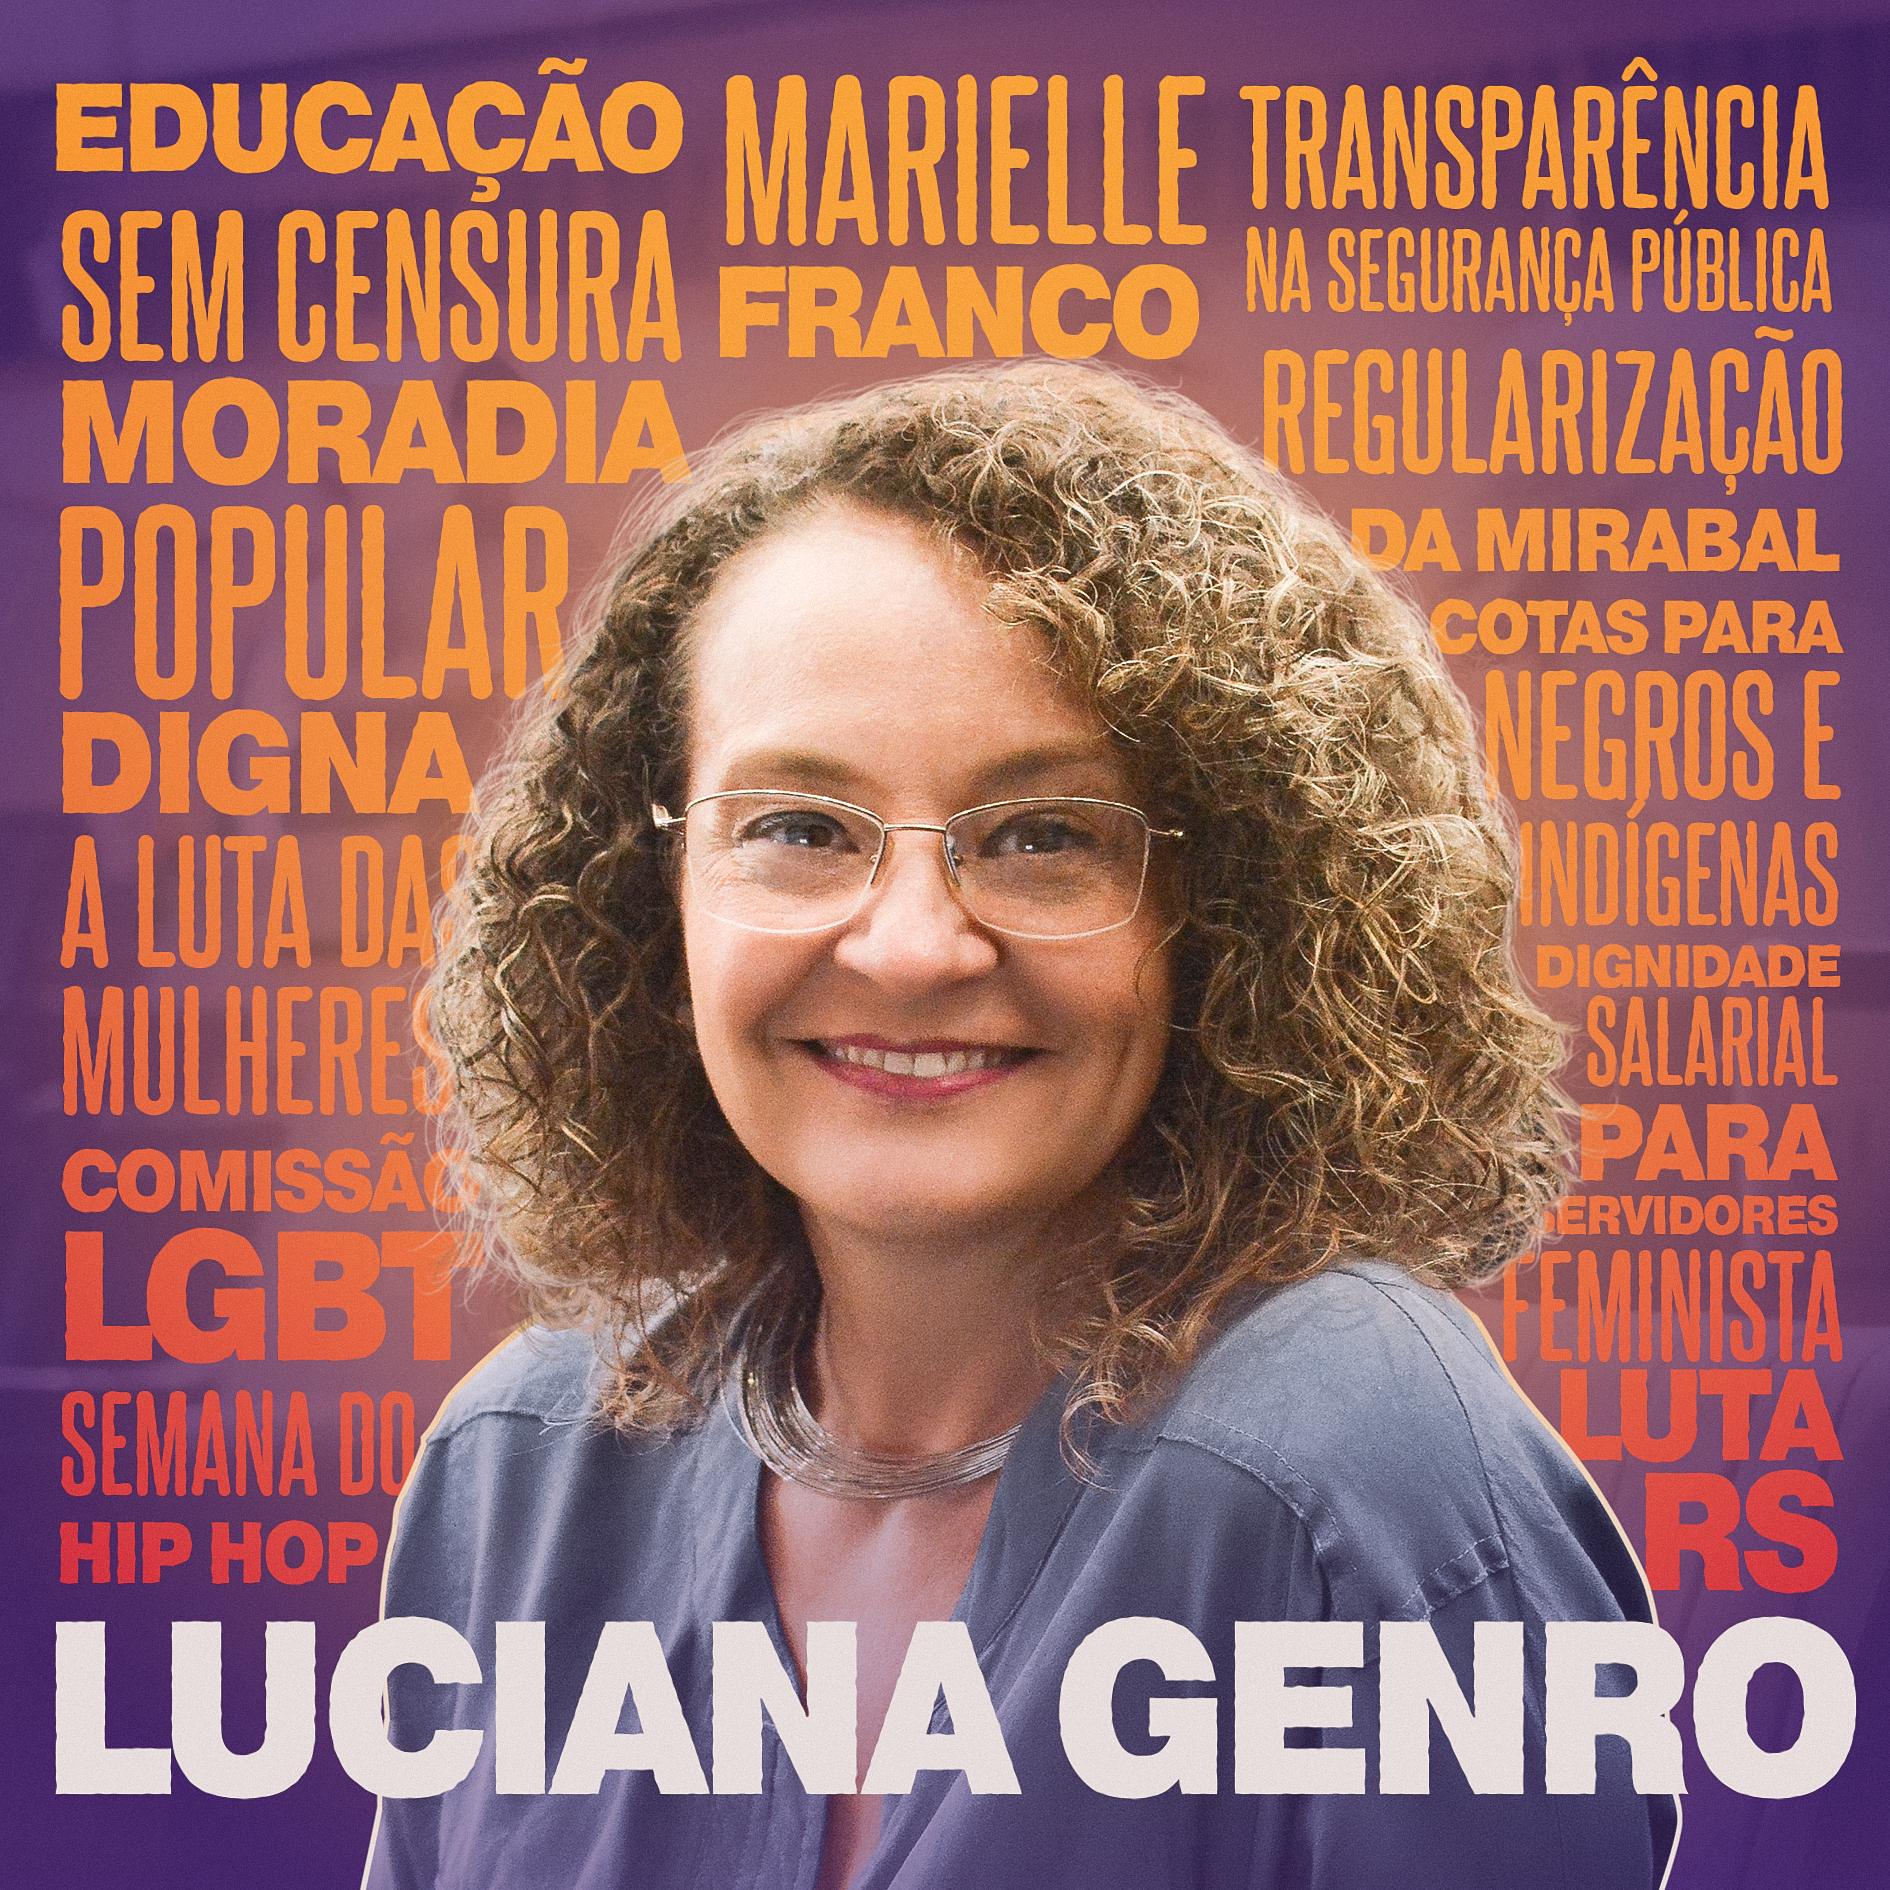 Luciana Genro Comenta show art